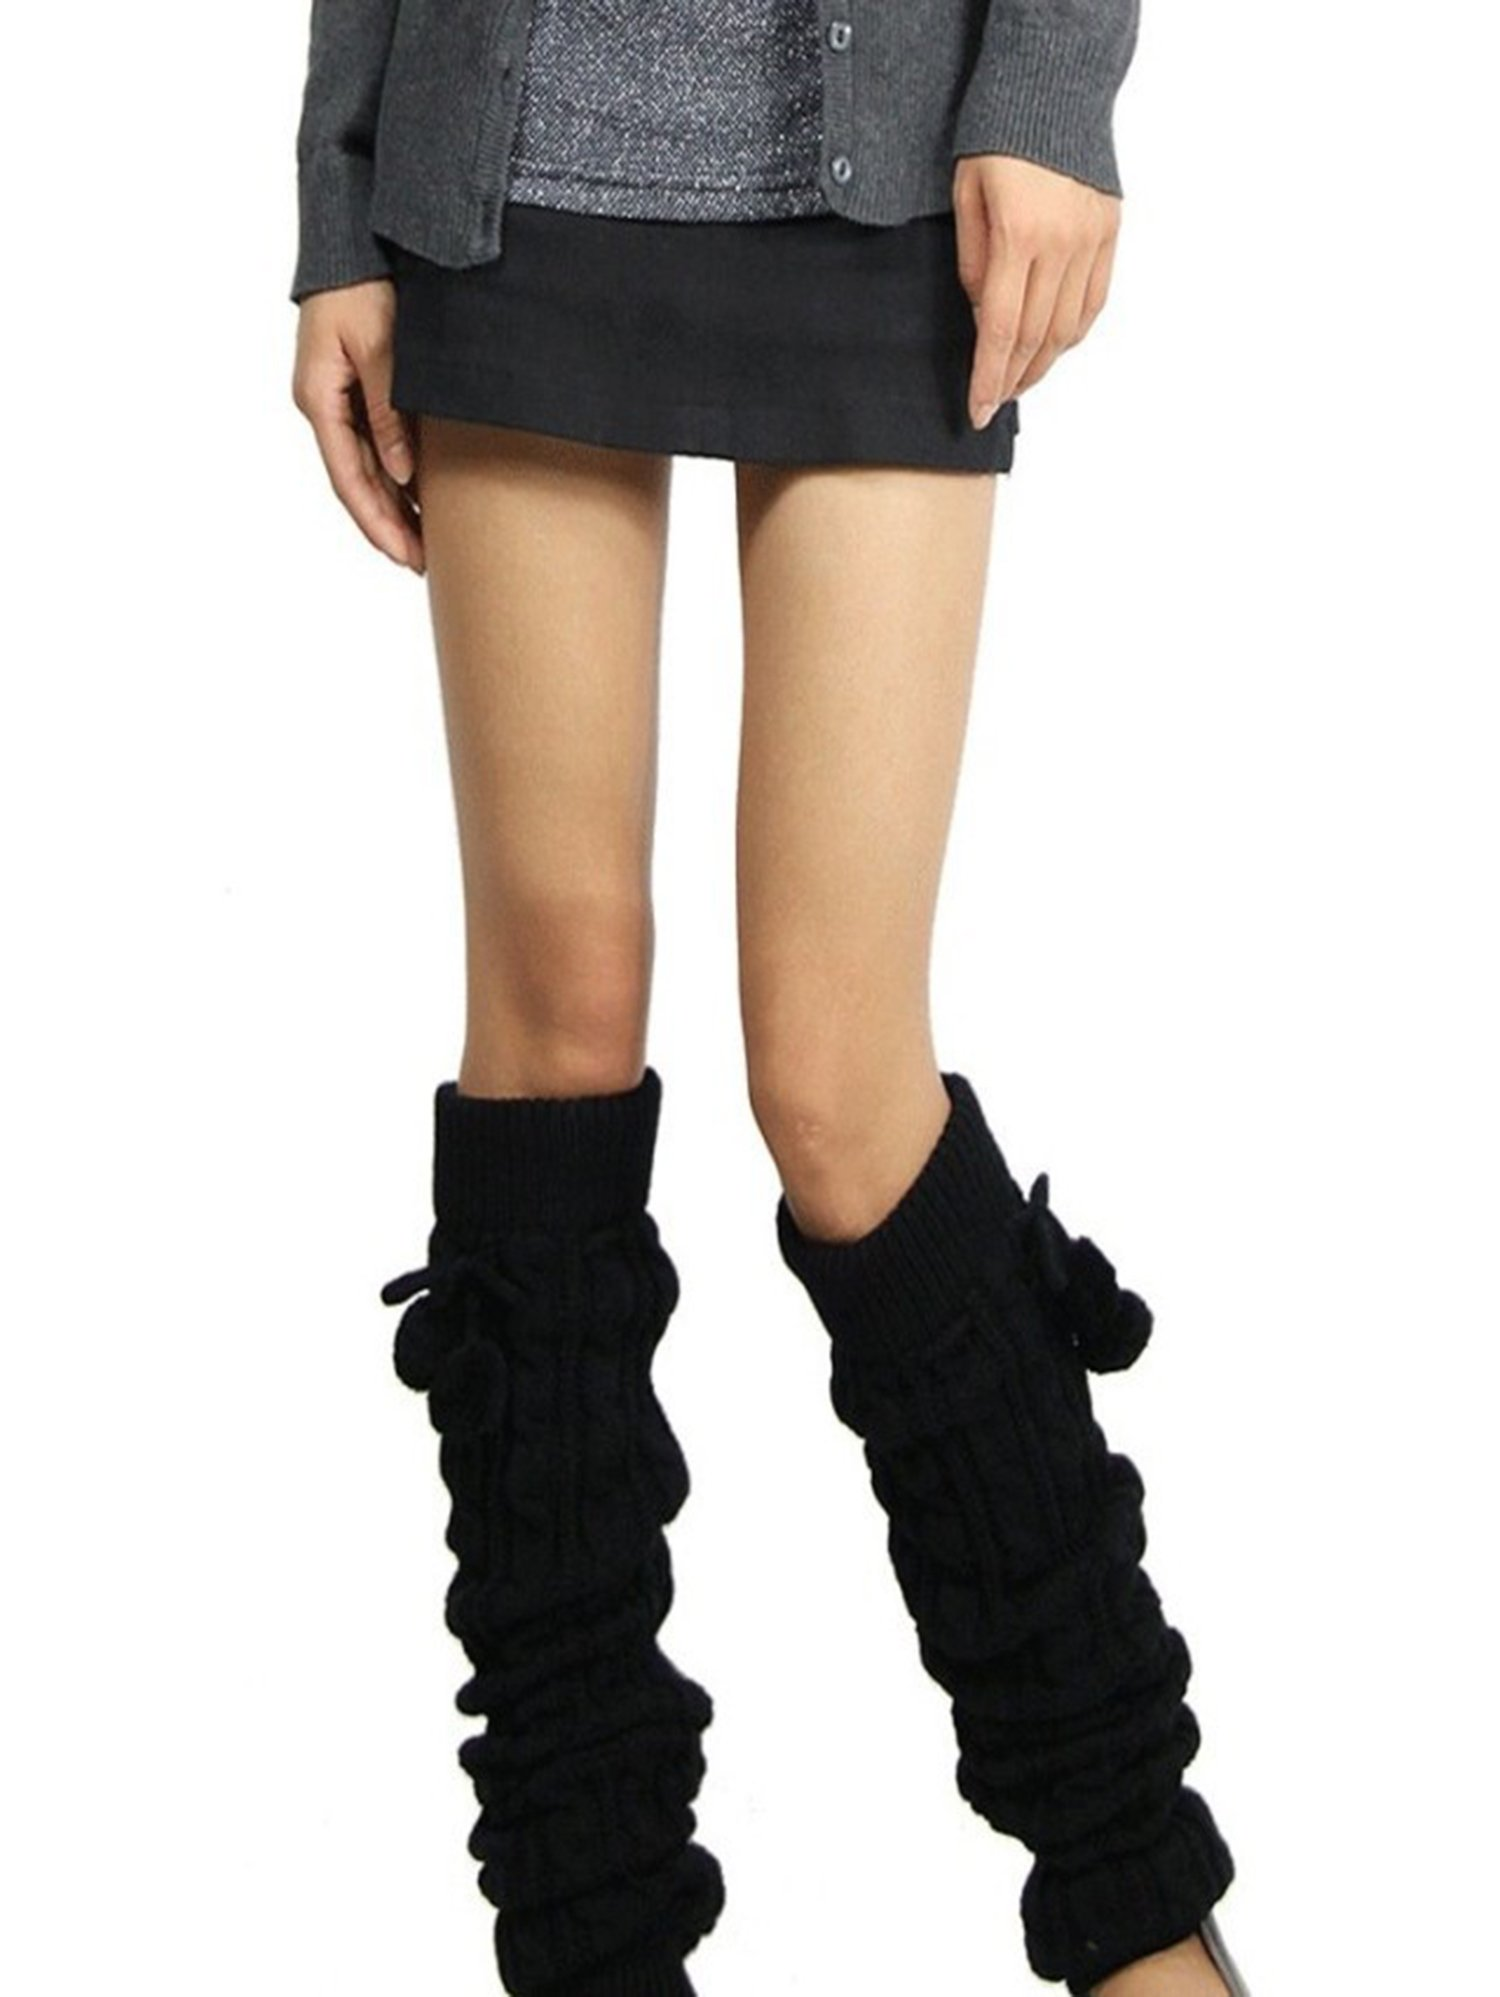 Women Leggings Boots Leg Warmer Knit Crochet Socks Cable Knit Long Boot Socks Legwear Pompom Leg Warmer Stocking, Black, One size(25.6inch)